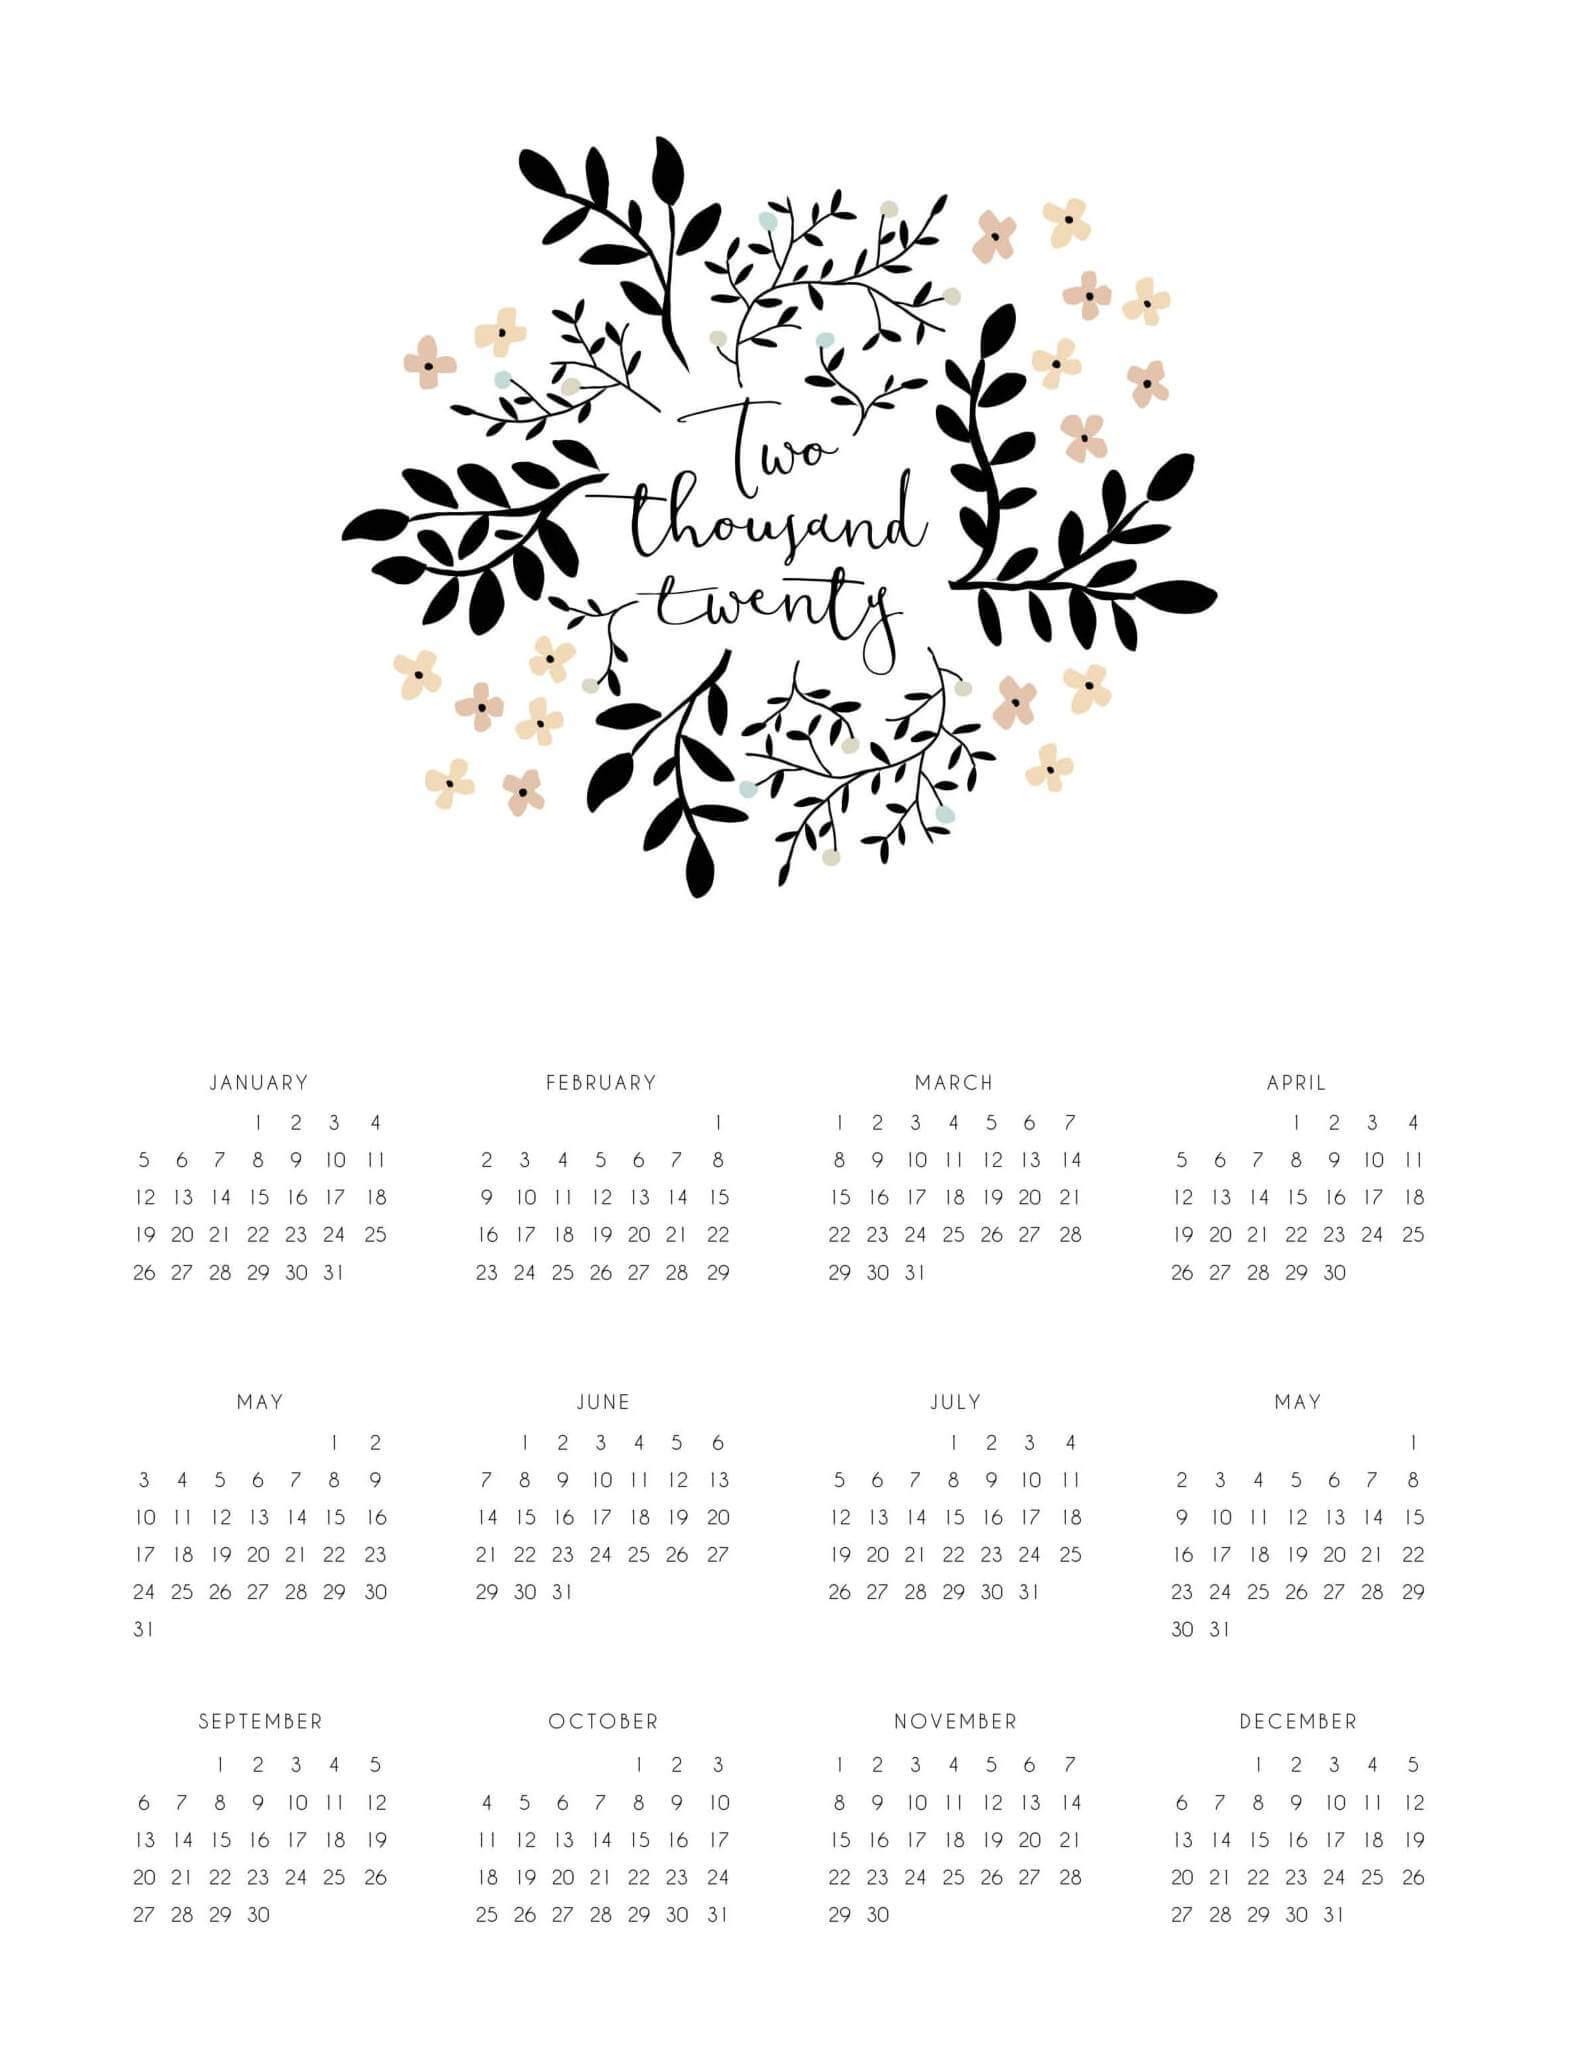 Editable Yearly Calendar 2020 South Africa